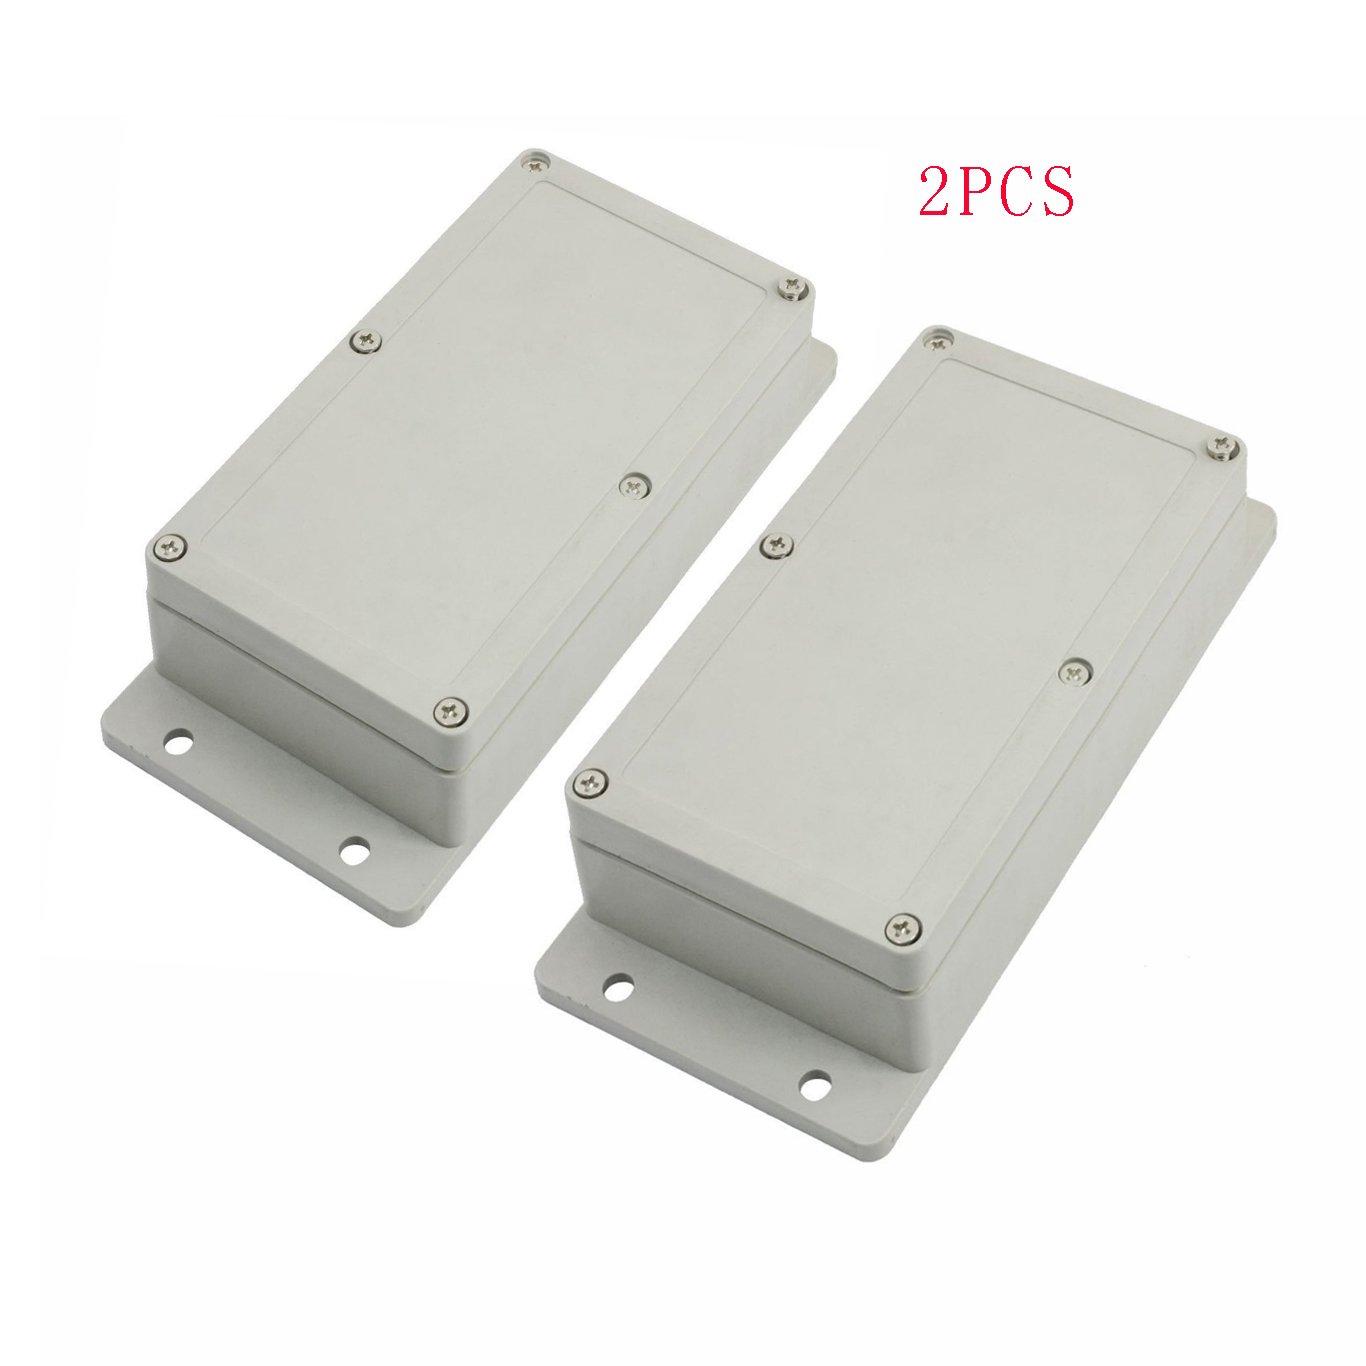 Saim ABS Plastic Waterproof Electronic Project DIY Junction Box Enclosure Case 158mmx90mmx46mm 2Pcs